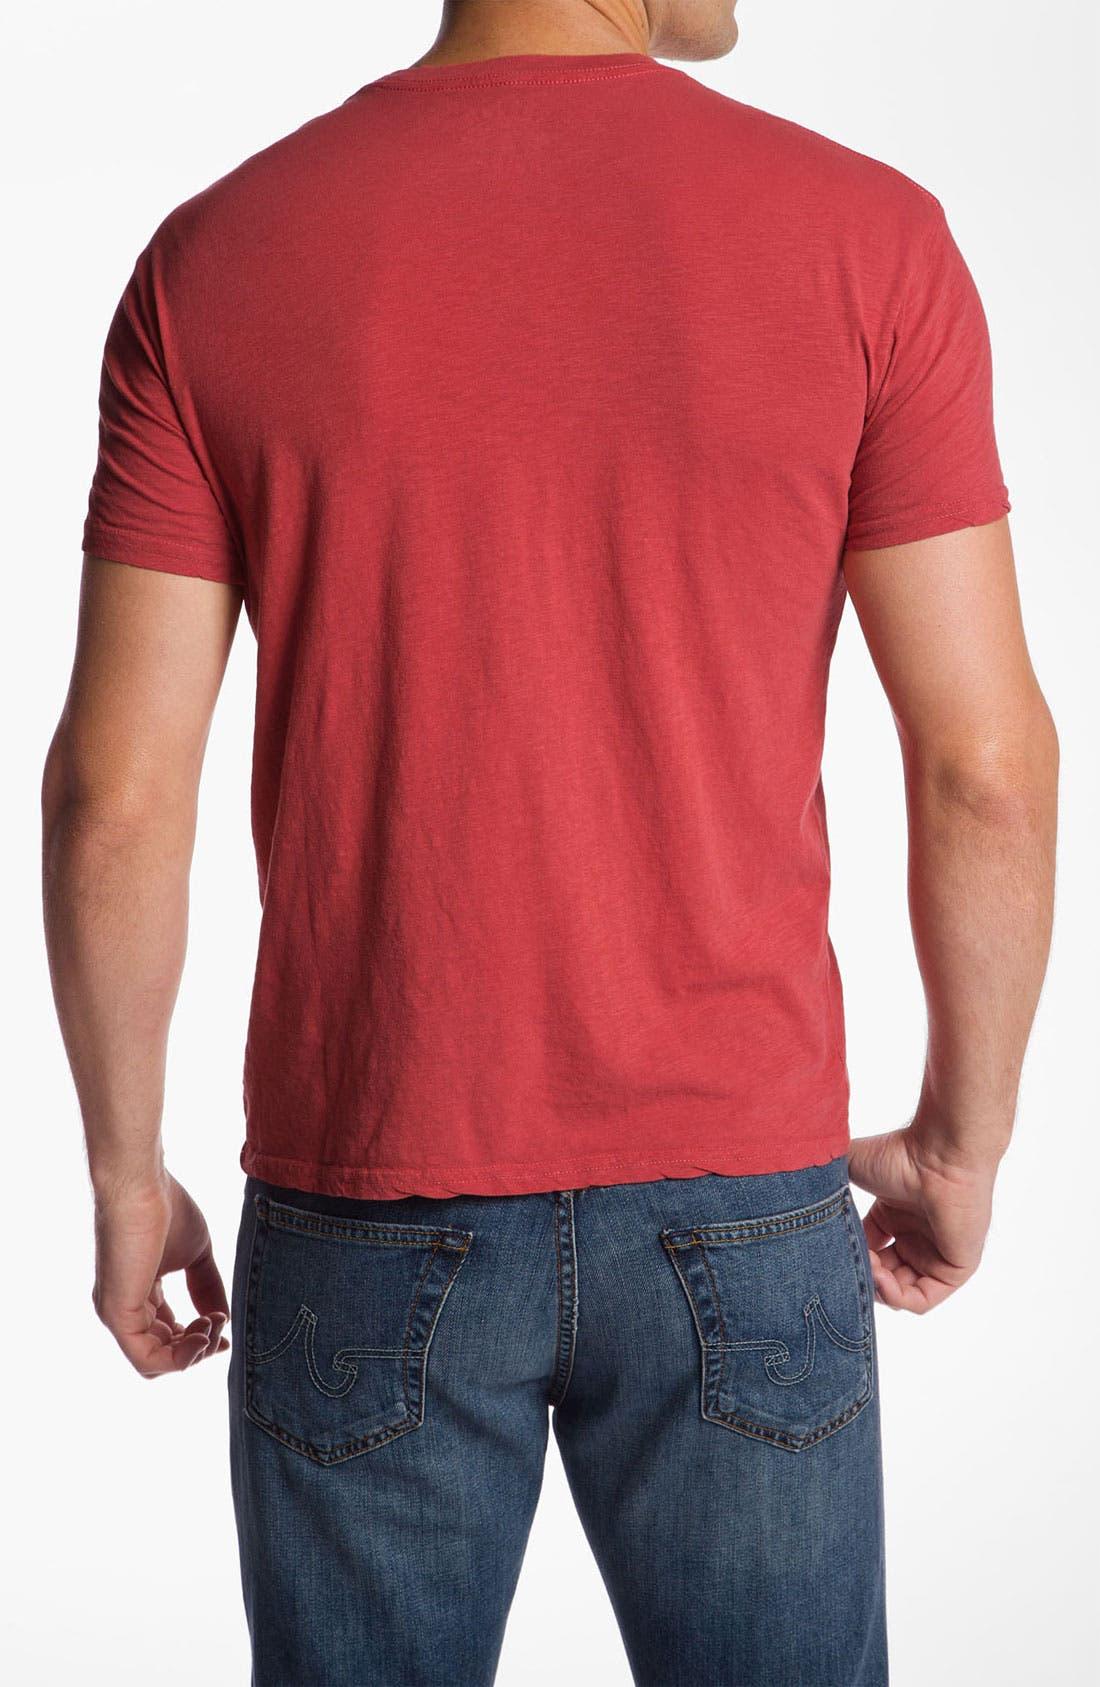 Alternate Image 2  - The Original Retro Brand 'University of Utah' T-Shirt